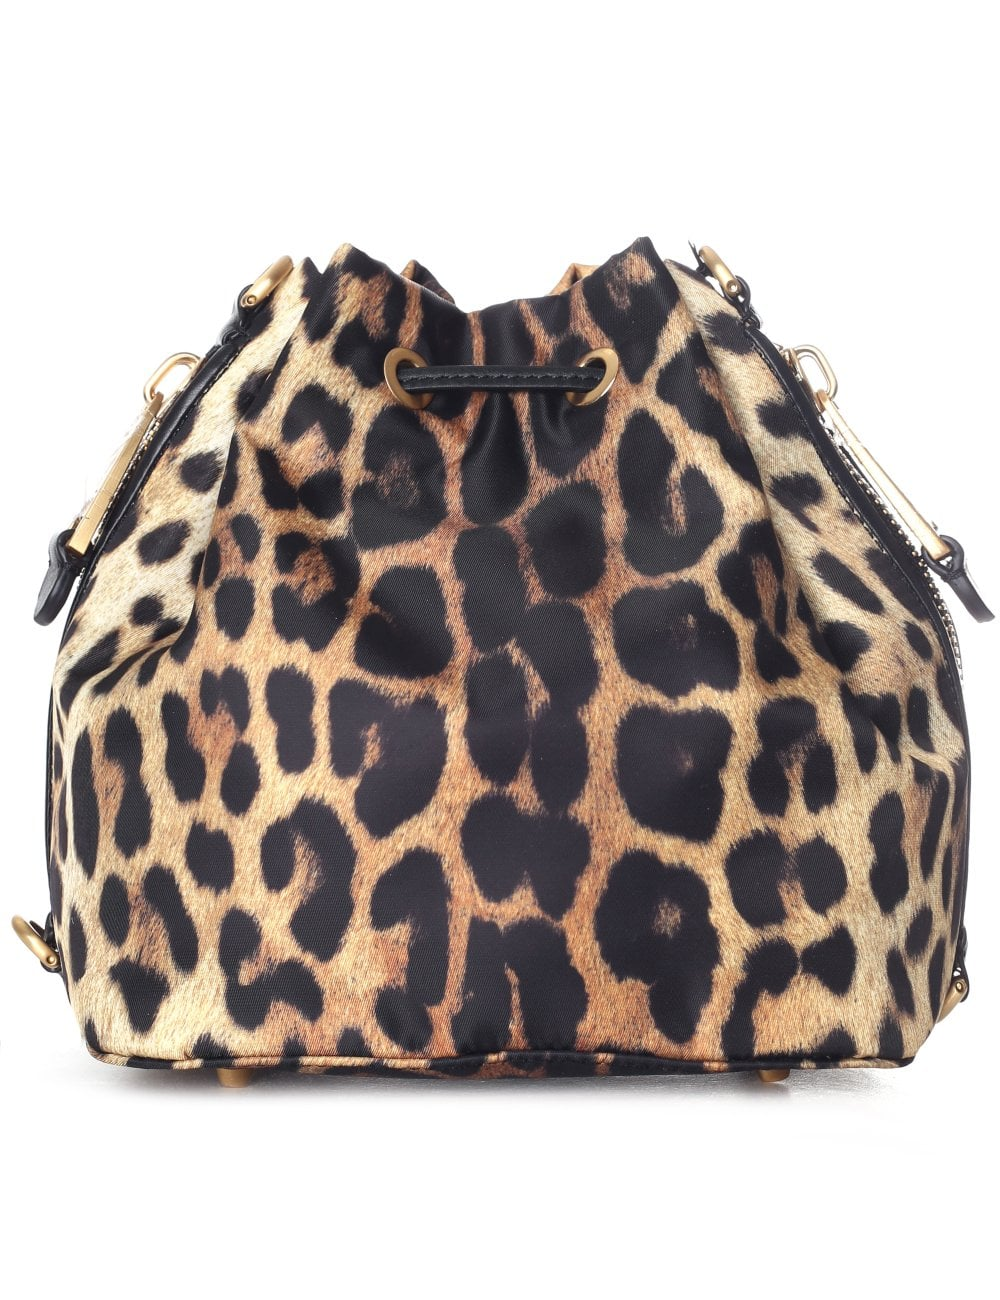 9ffec98eb9c5 Moschino Couture Women's Small Leopard Bucket Bag